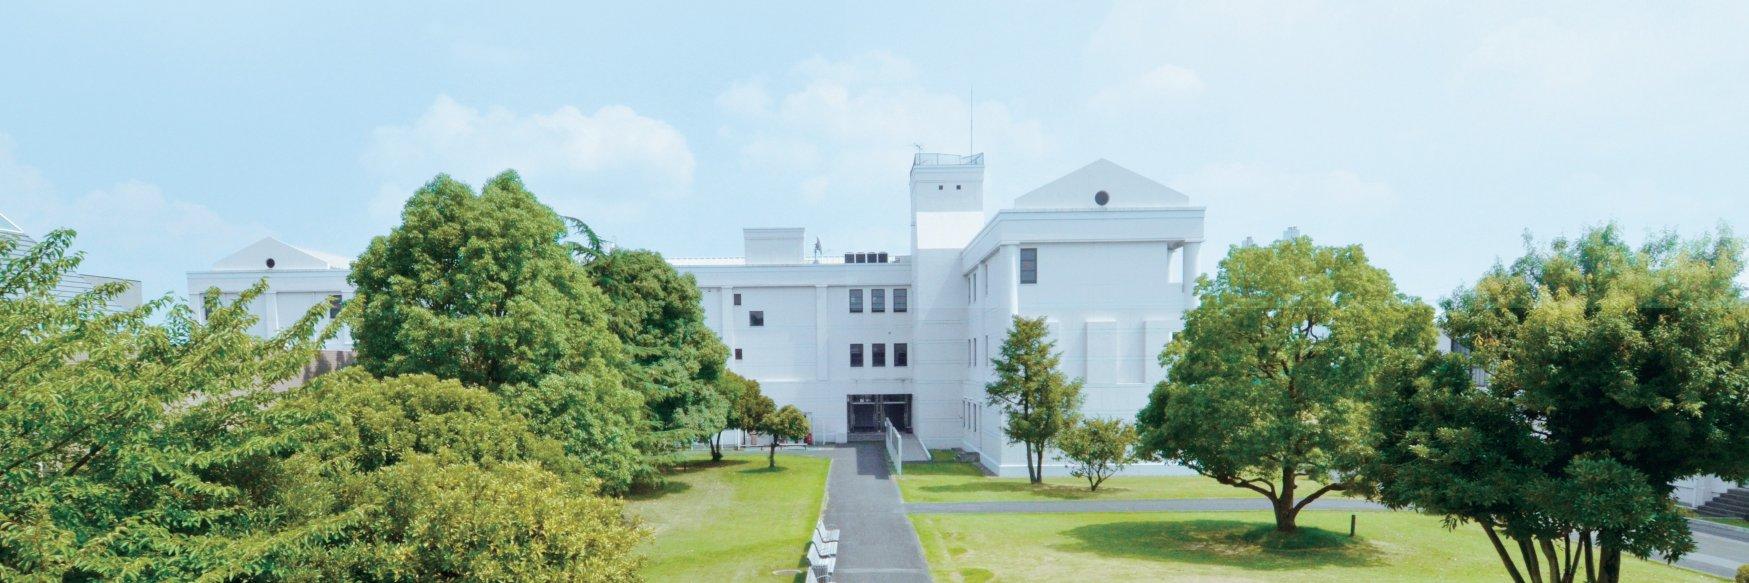 Kanto Gakuen University's official Twitter account